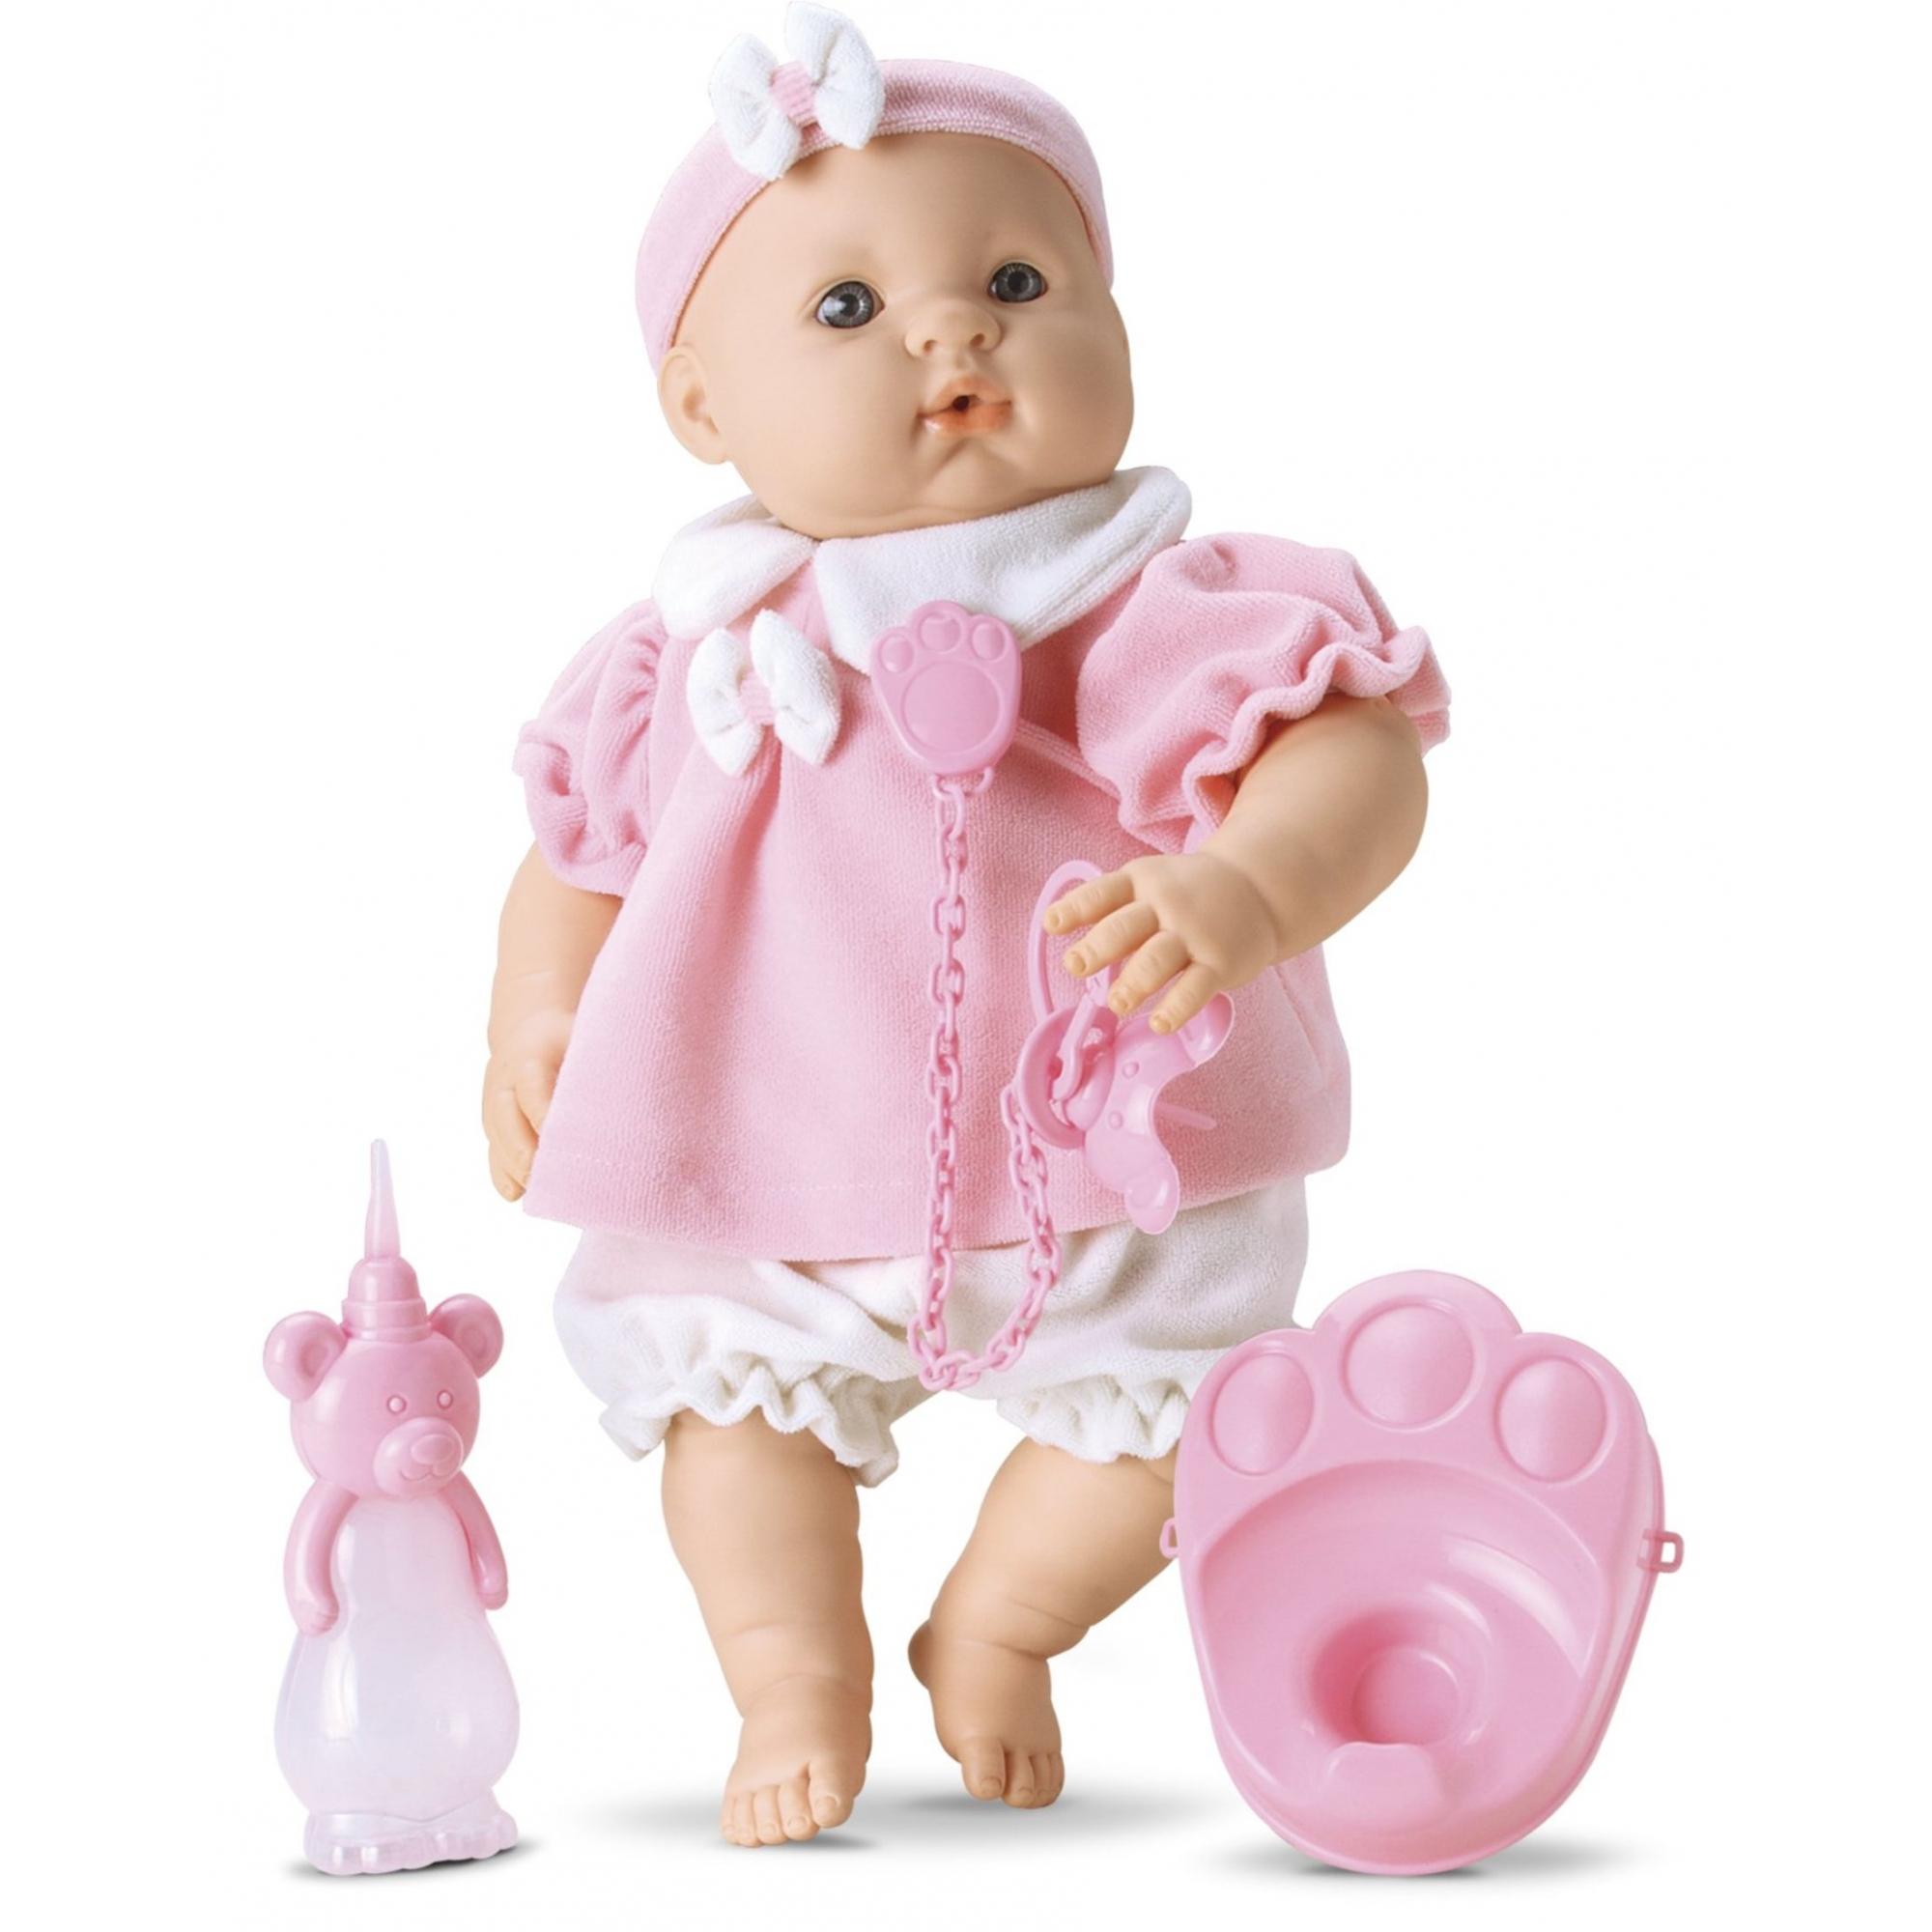 Boneca Bolita - Xixi - Roma Brinquedos